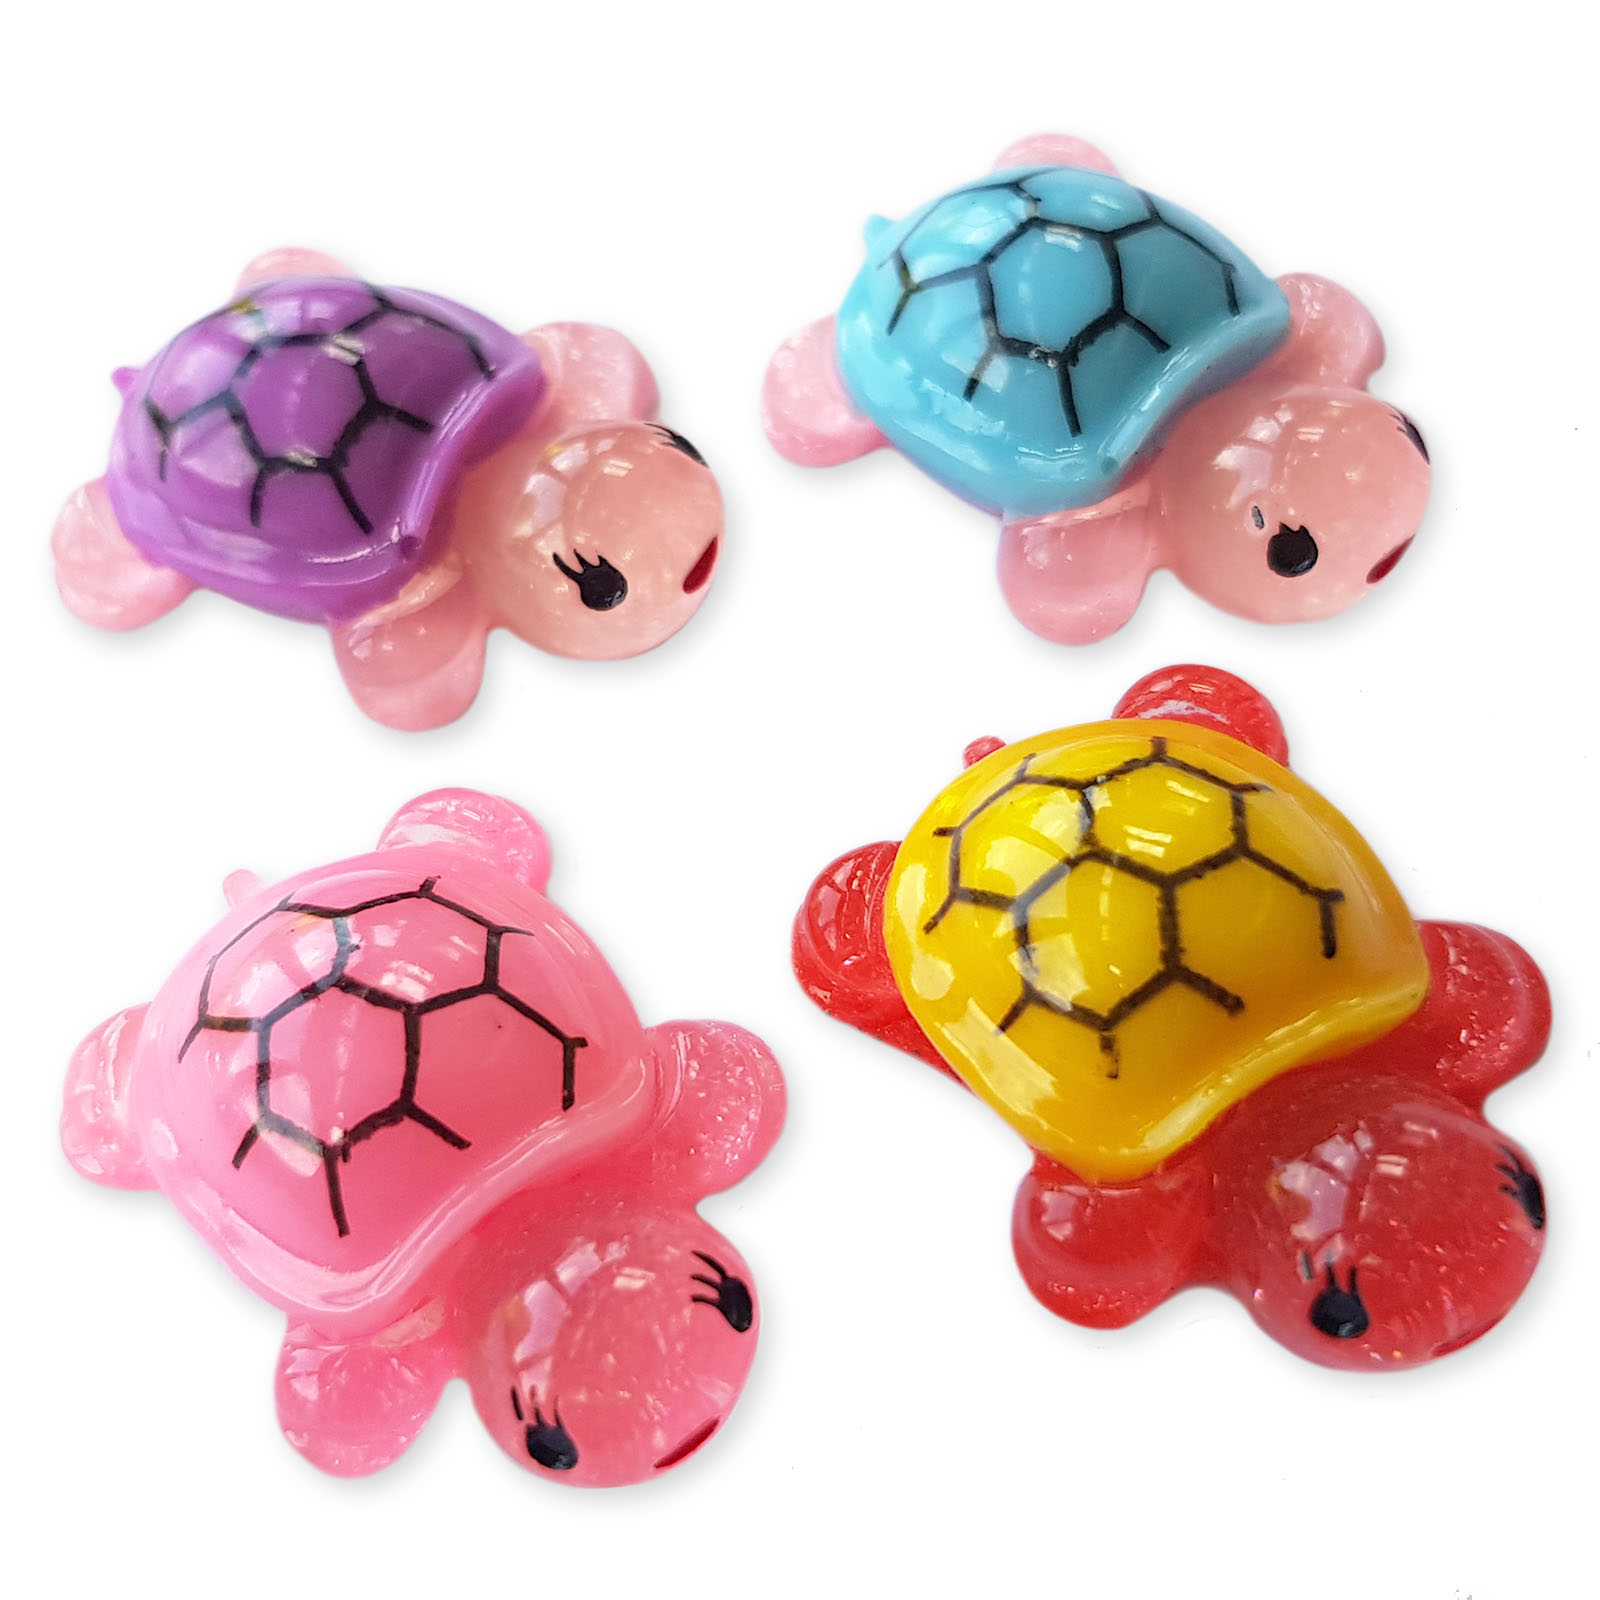 4pcs Cute Chicks Resin Kawaii Flatback Cabochons Embellishment Decoden Craft